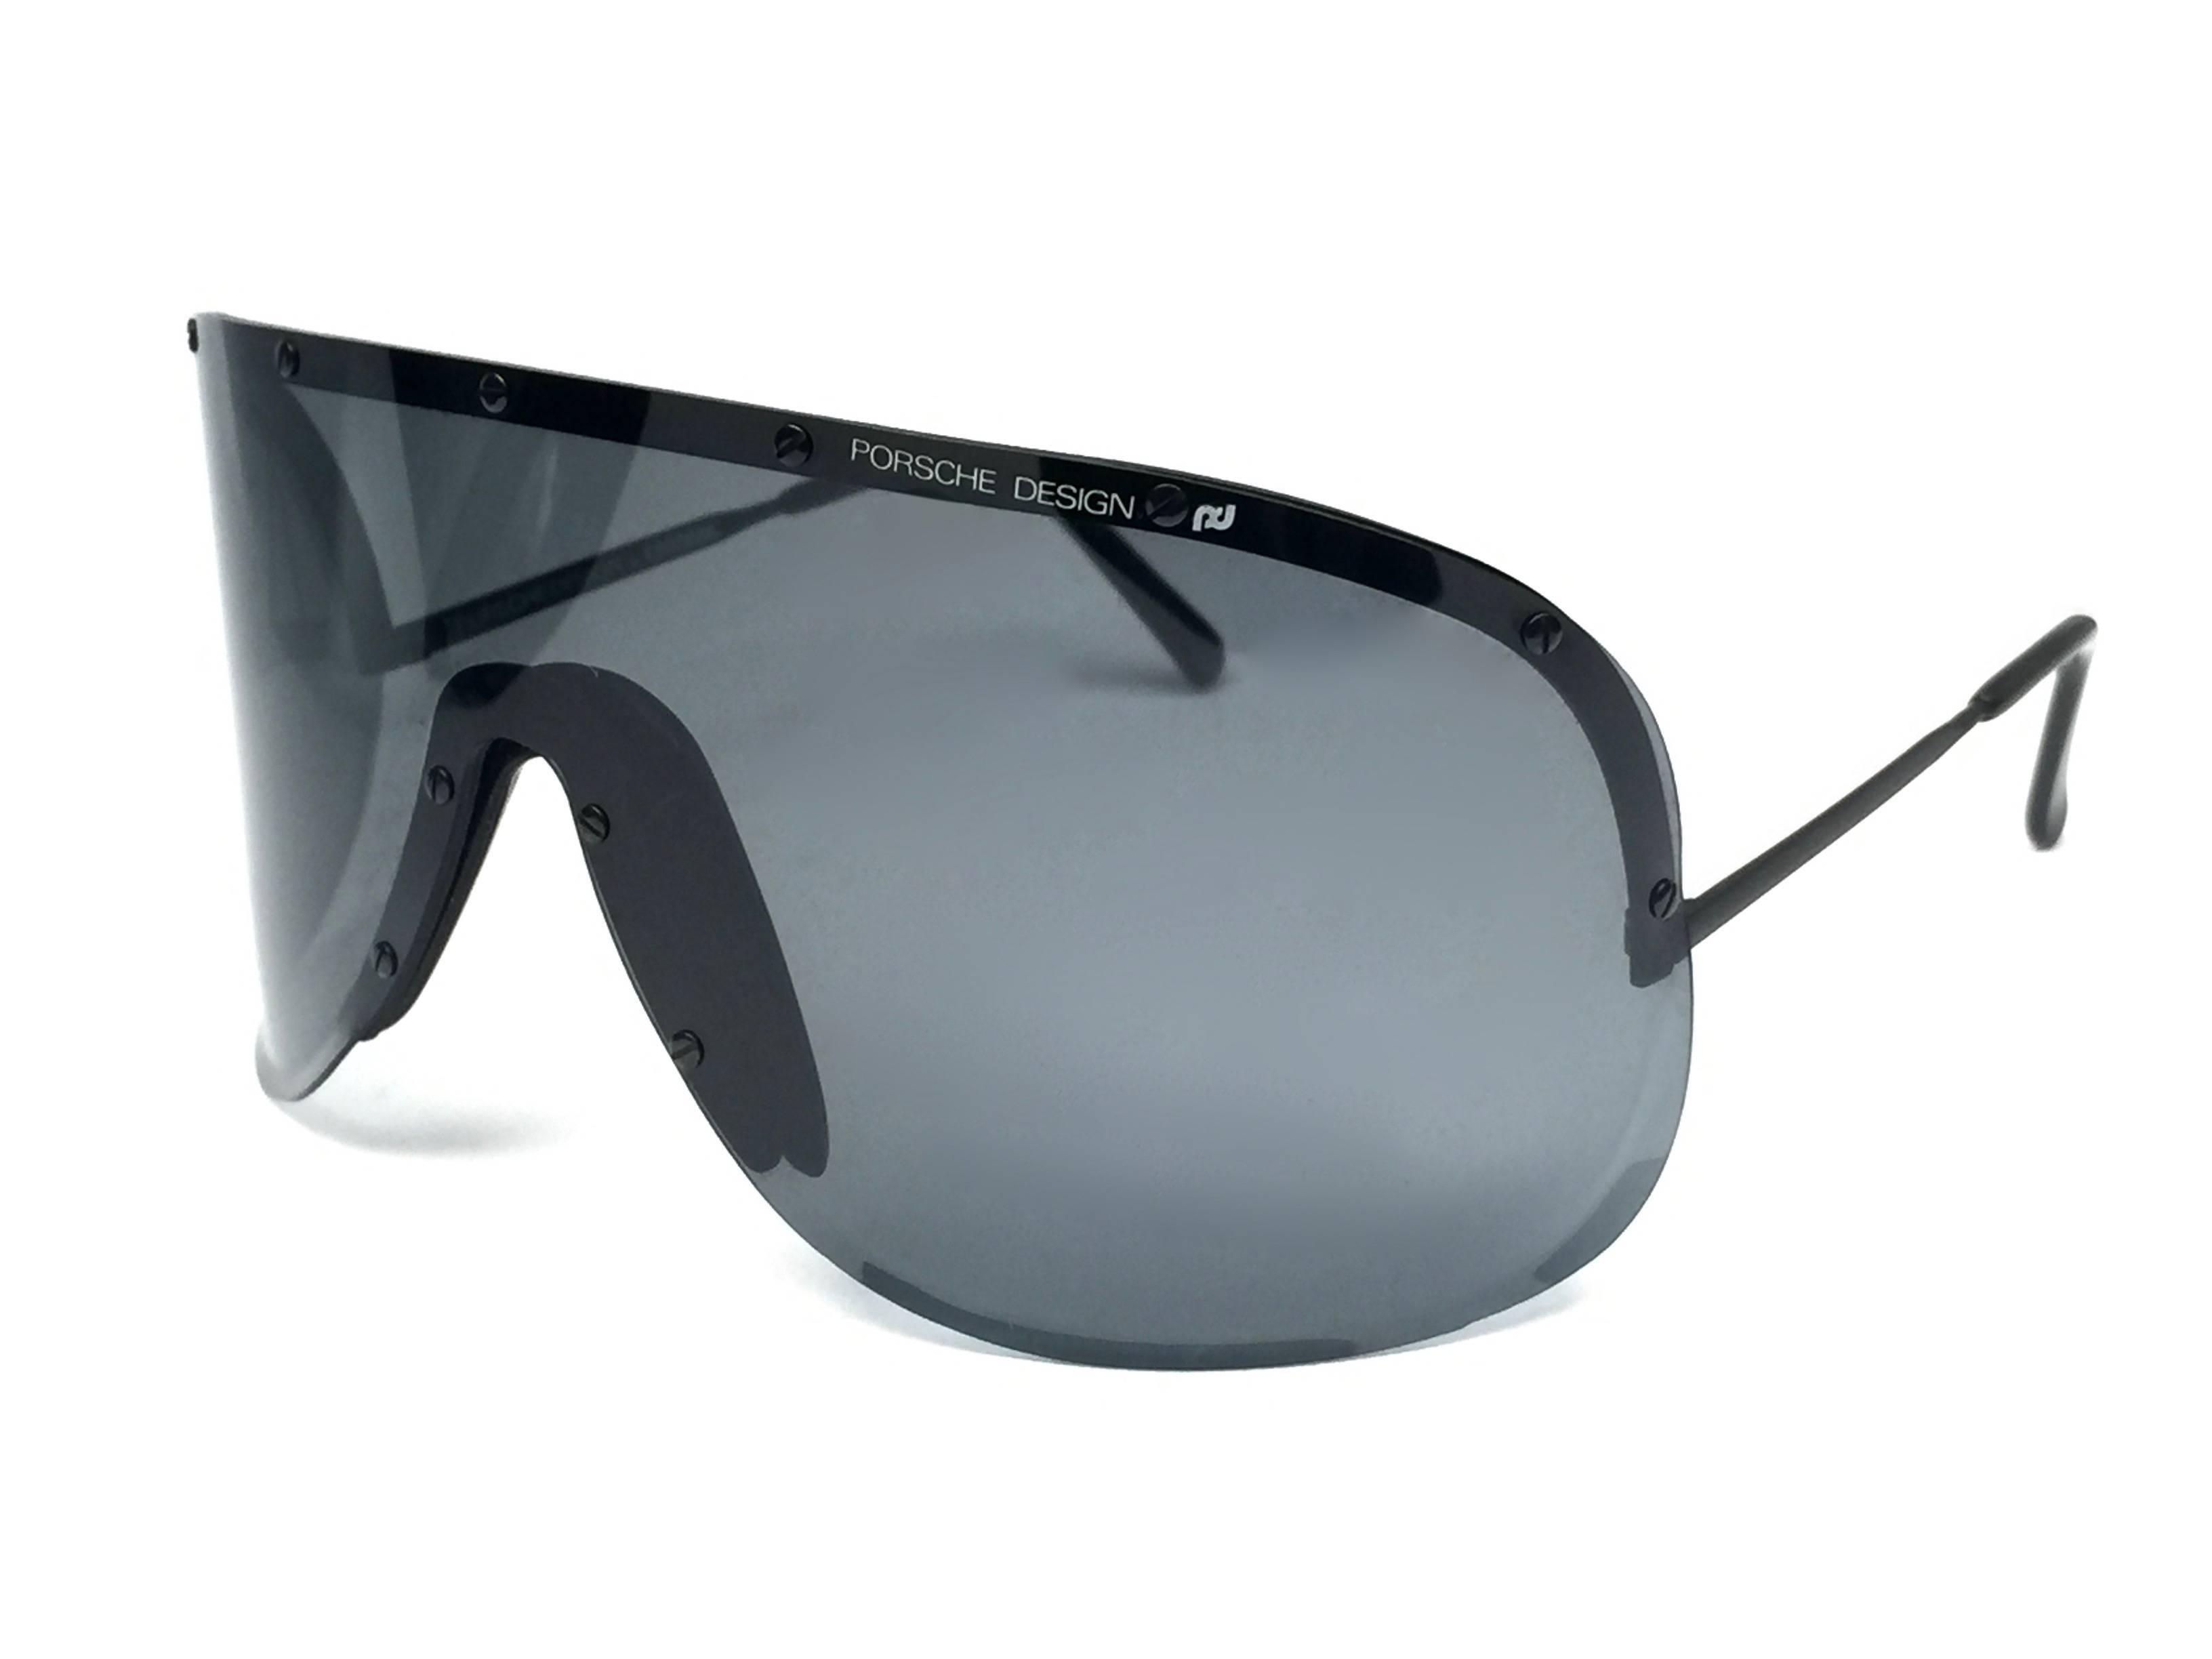 daeace9076 Porsche Design 5620 90 Vintage Shield Yoko Ono Sunglasses